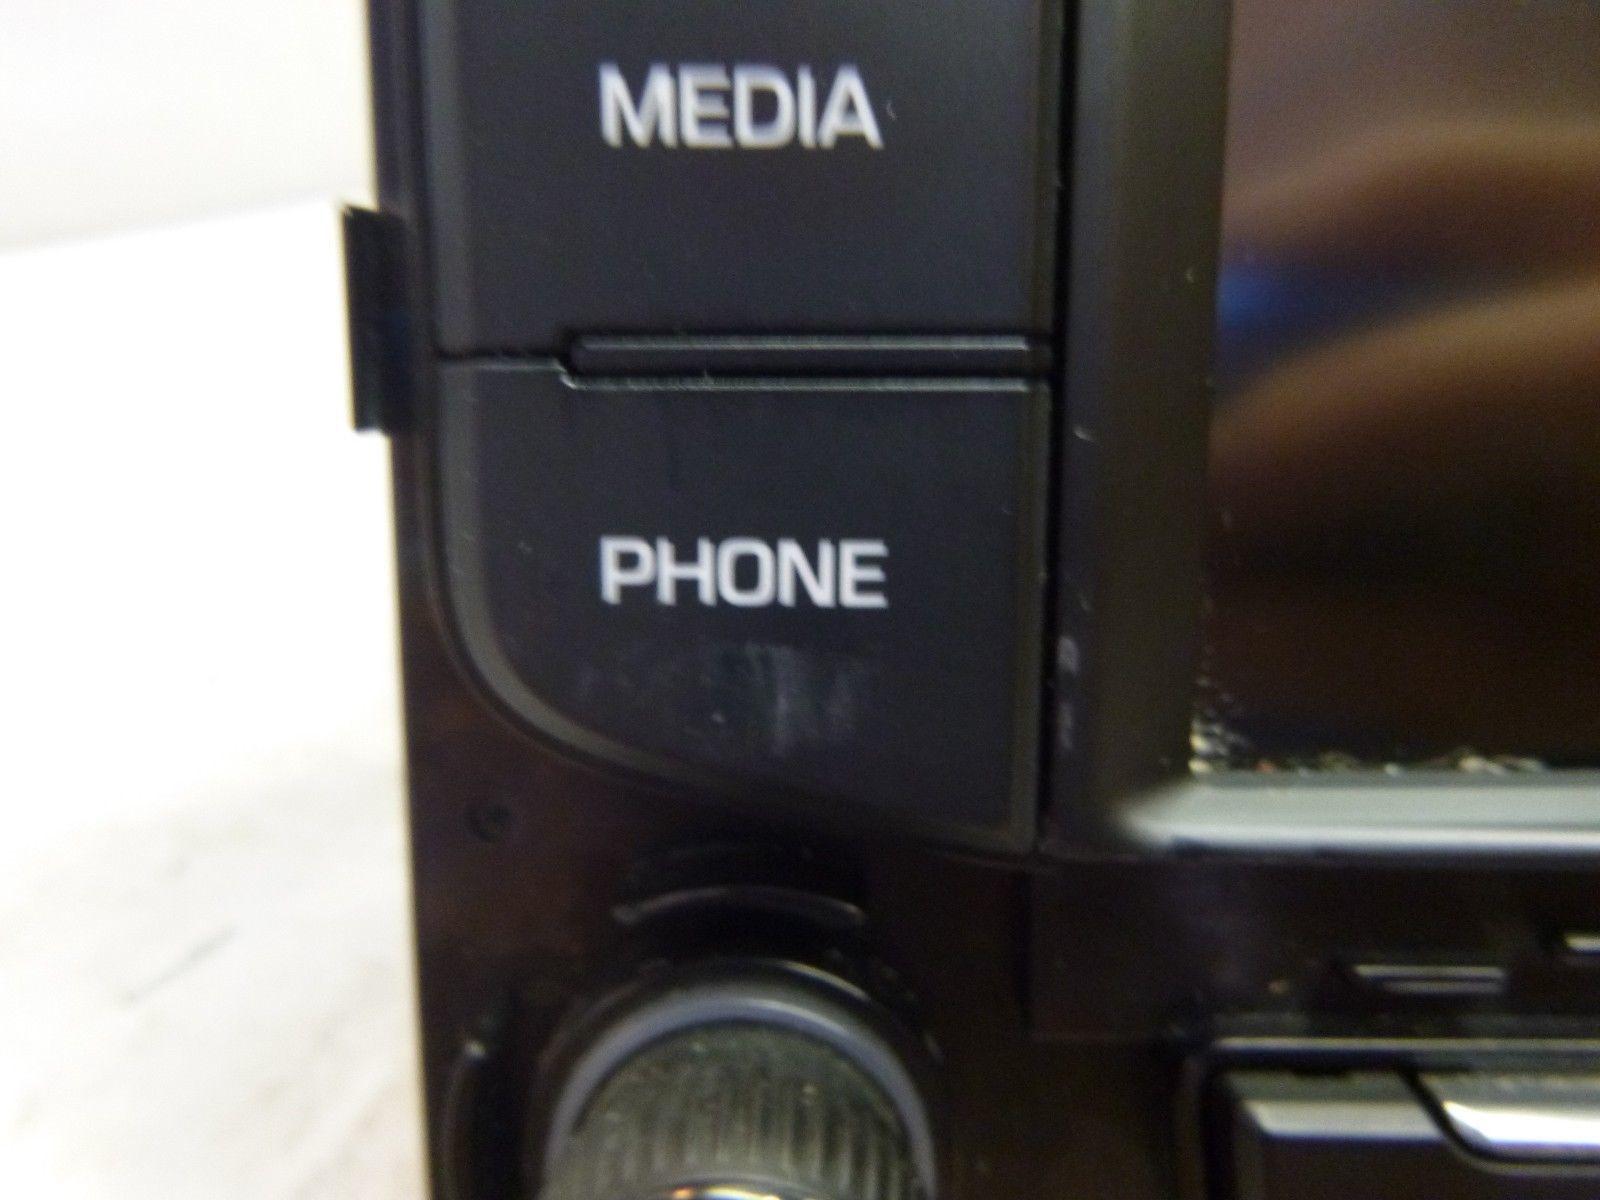 15 16 17 Hyundai Sonata Radio Cd MP3 Player 96180-C20004X BN55